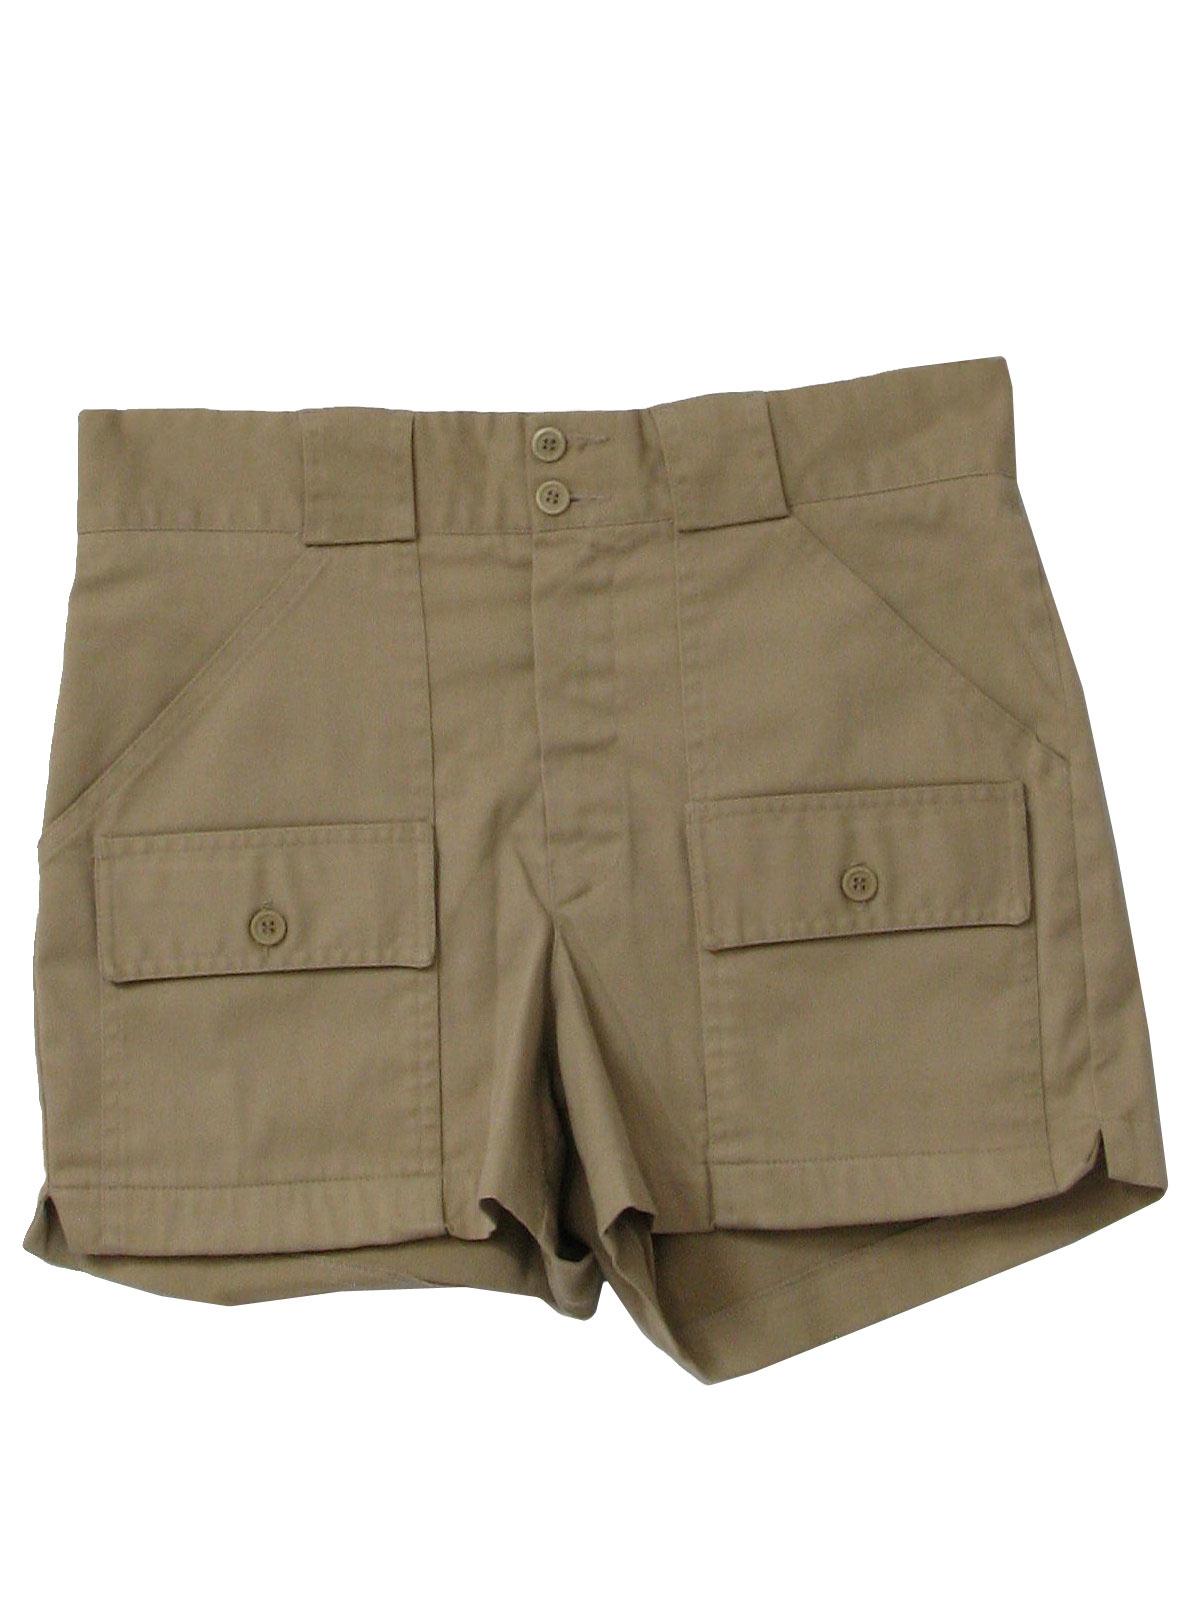 Vintage Eddie Bauer Nineties Shorts: 90s -Eddie Bauer- Mens khaki ...